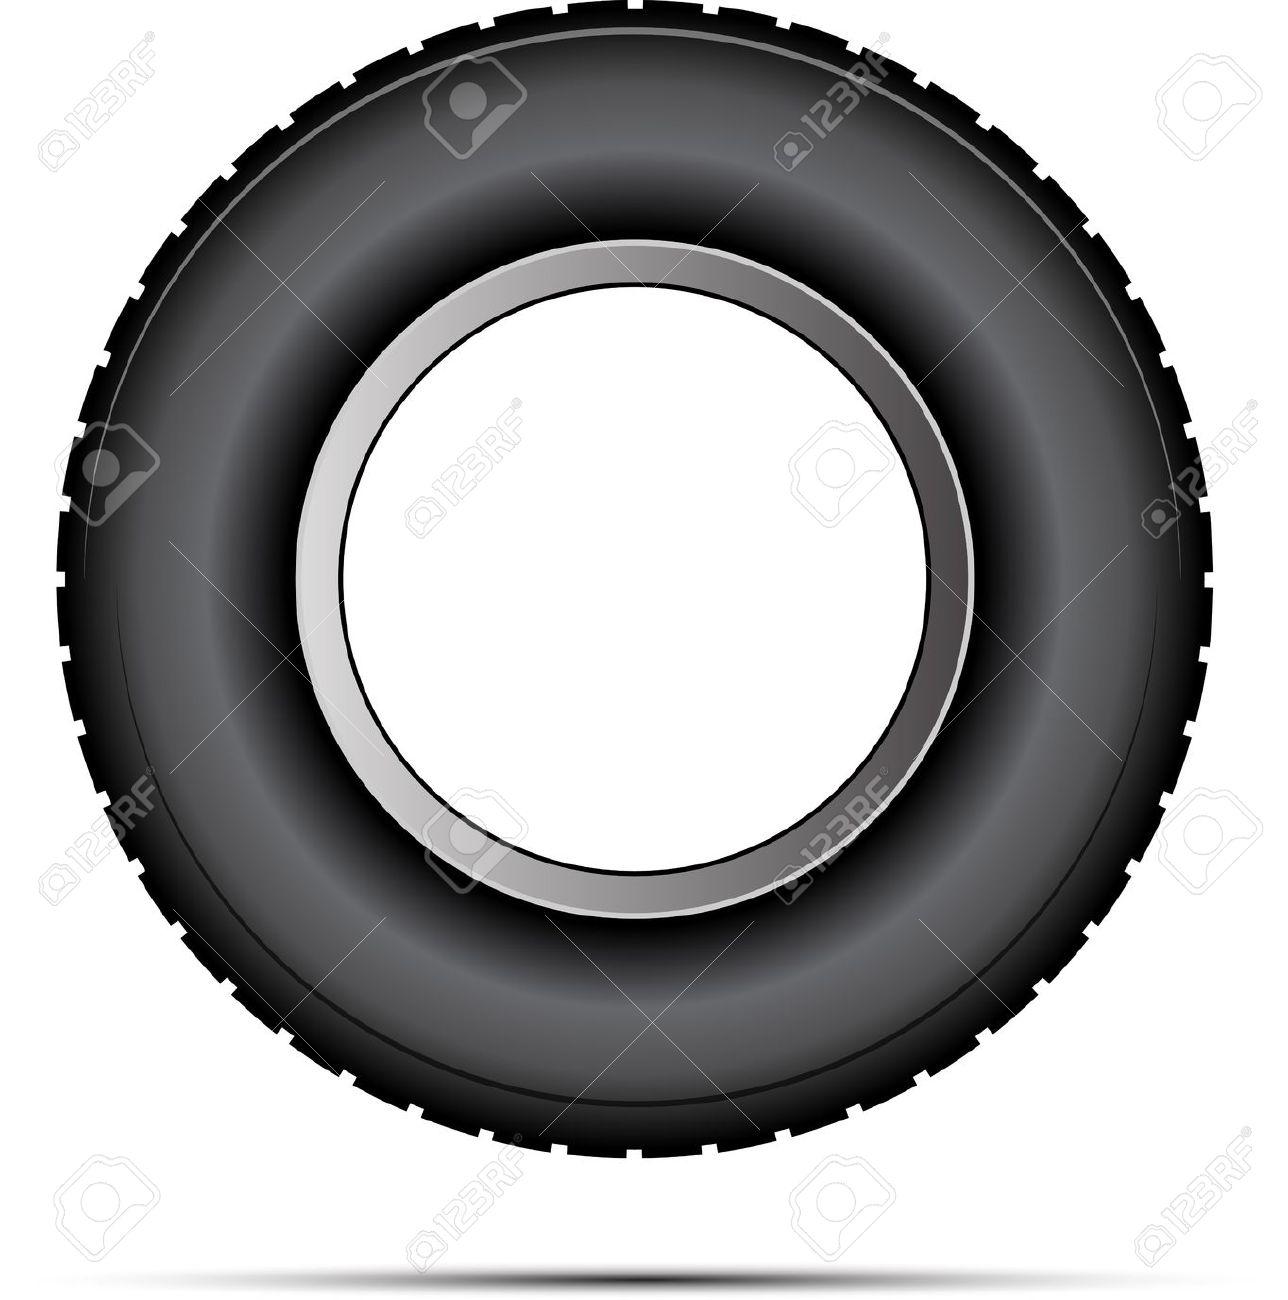 1288x1300 Tires Clipart Vector